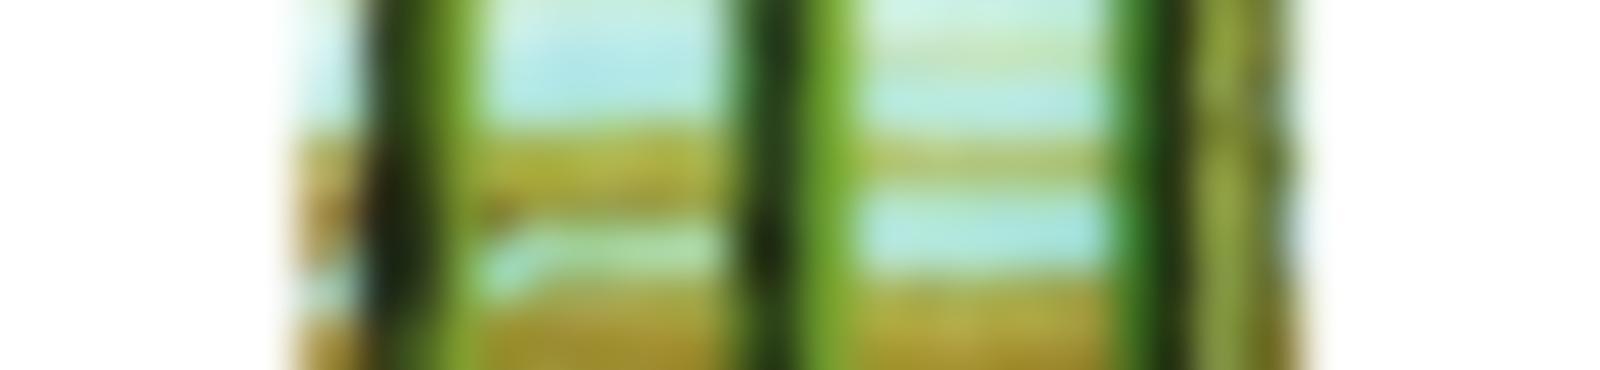 Blurred fenster11 188x300